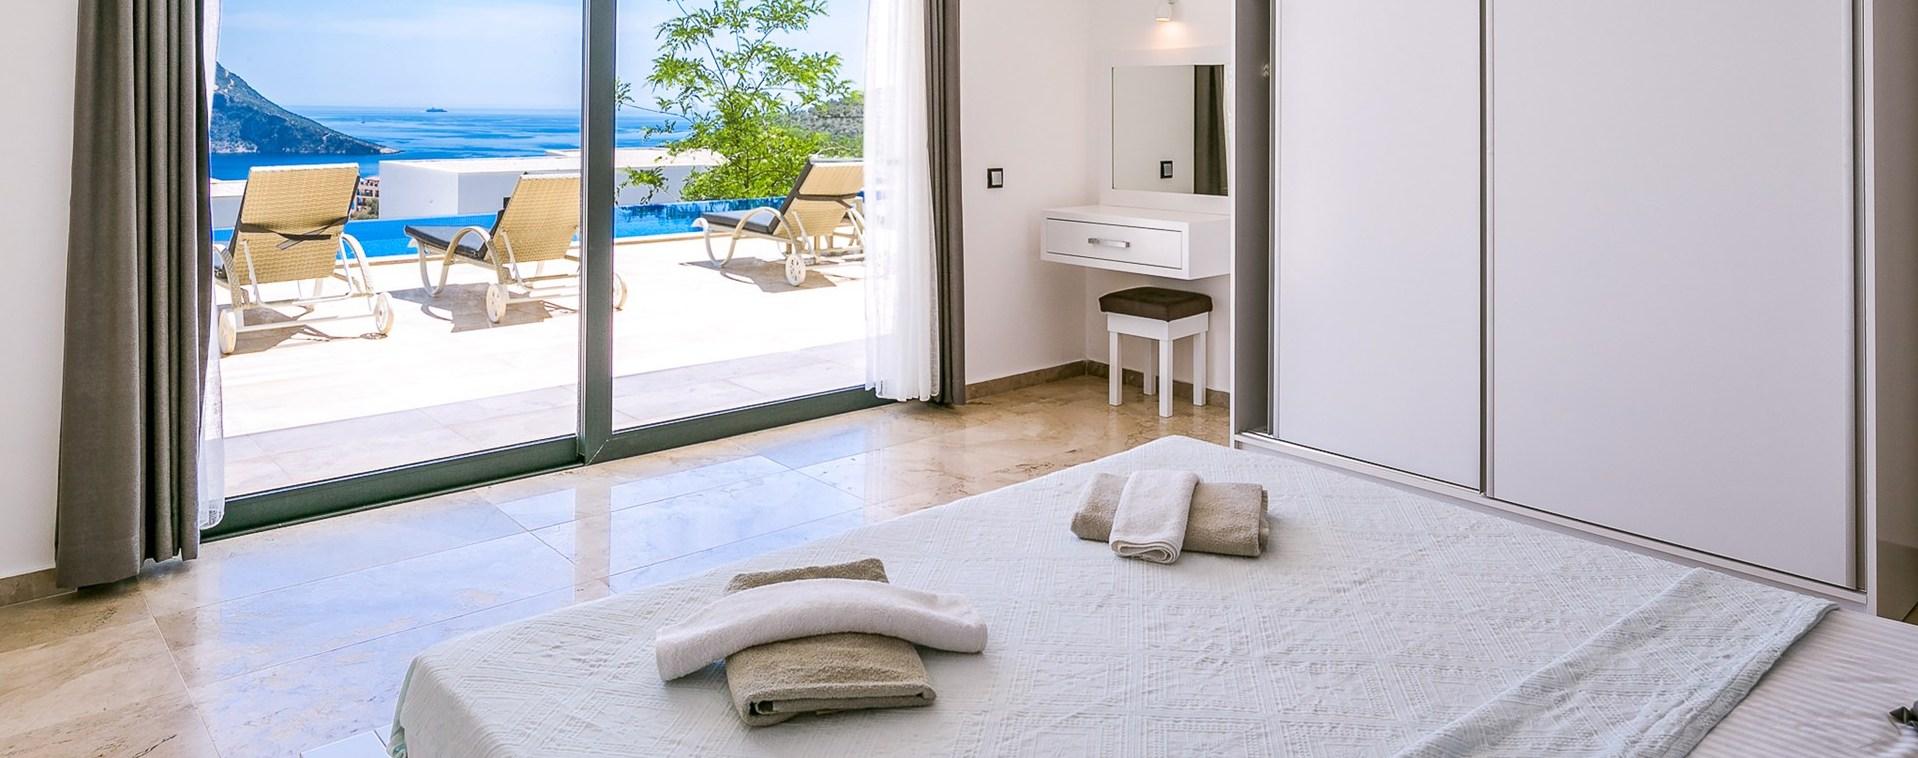 pool-terrace-bedroom-villa-rana